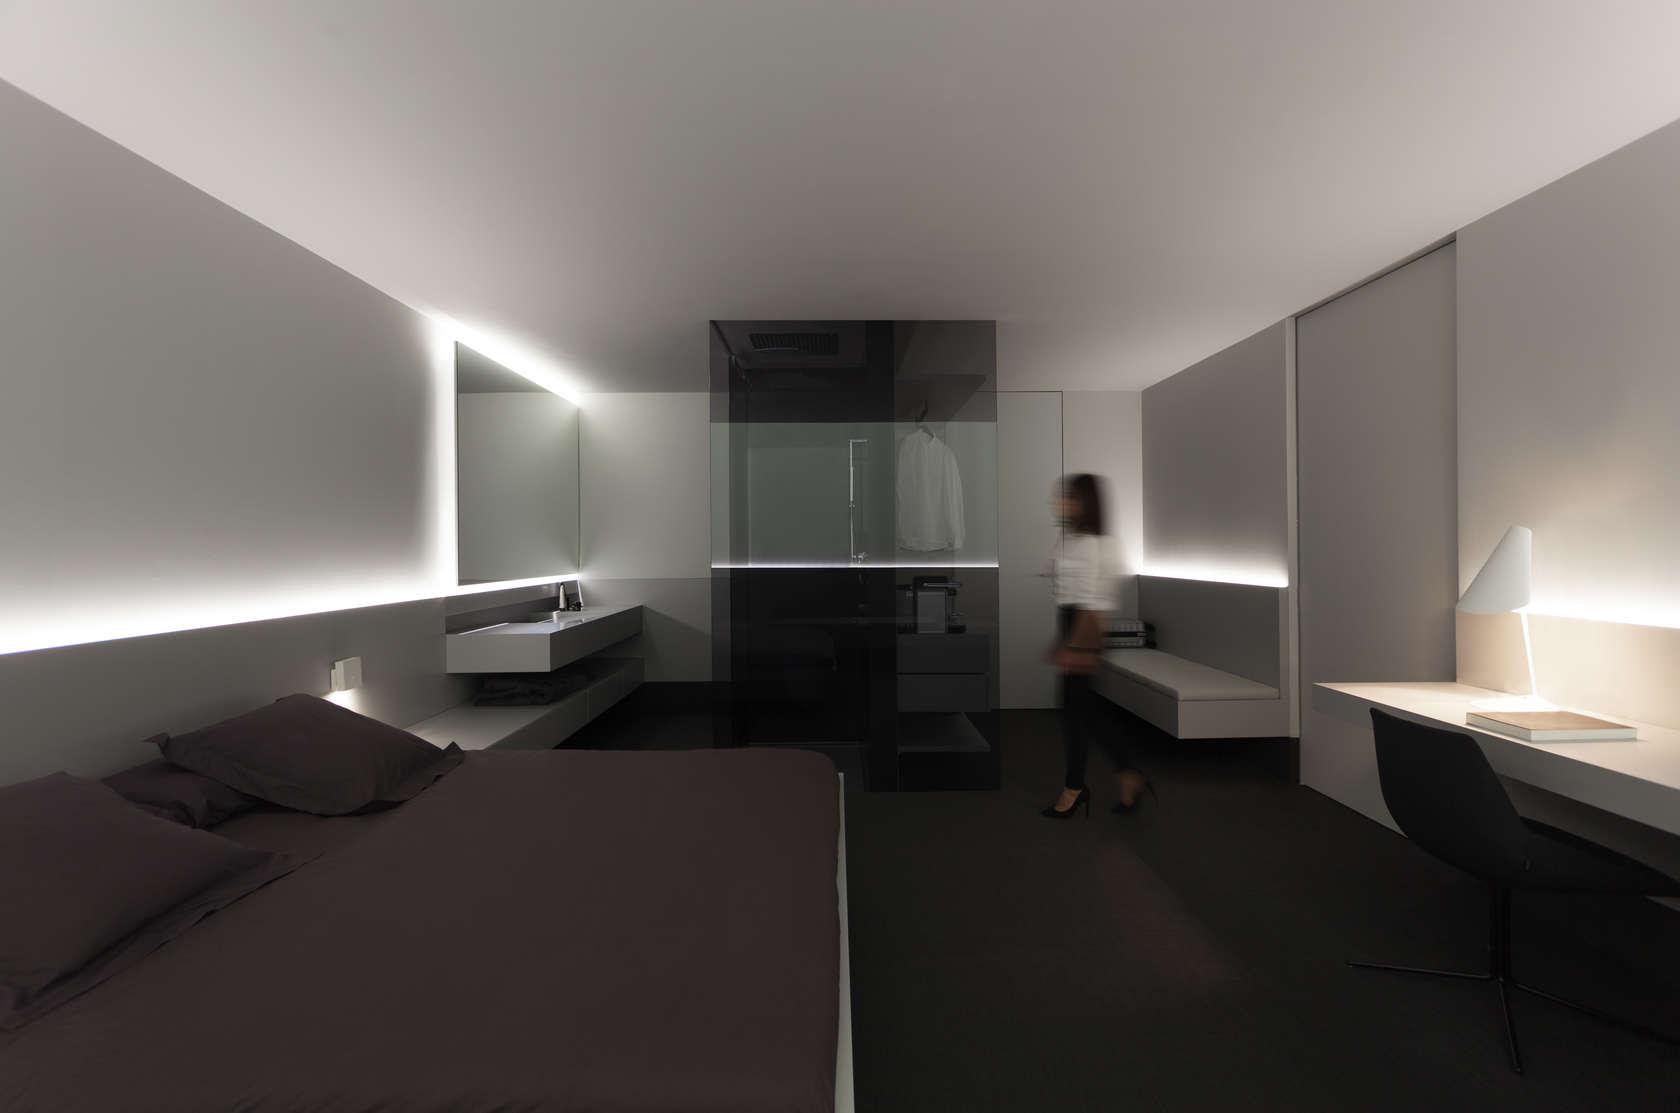 Fran silvestre arquitectos architizer - Arquitectos de interiores ...